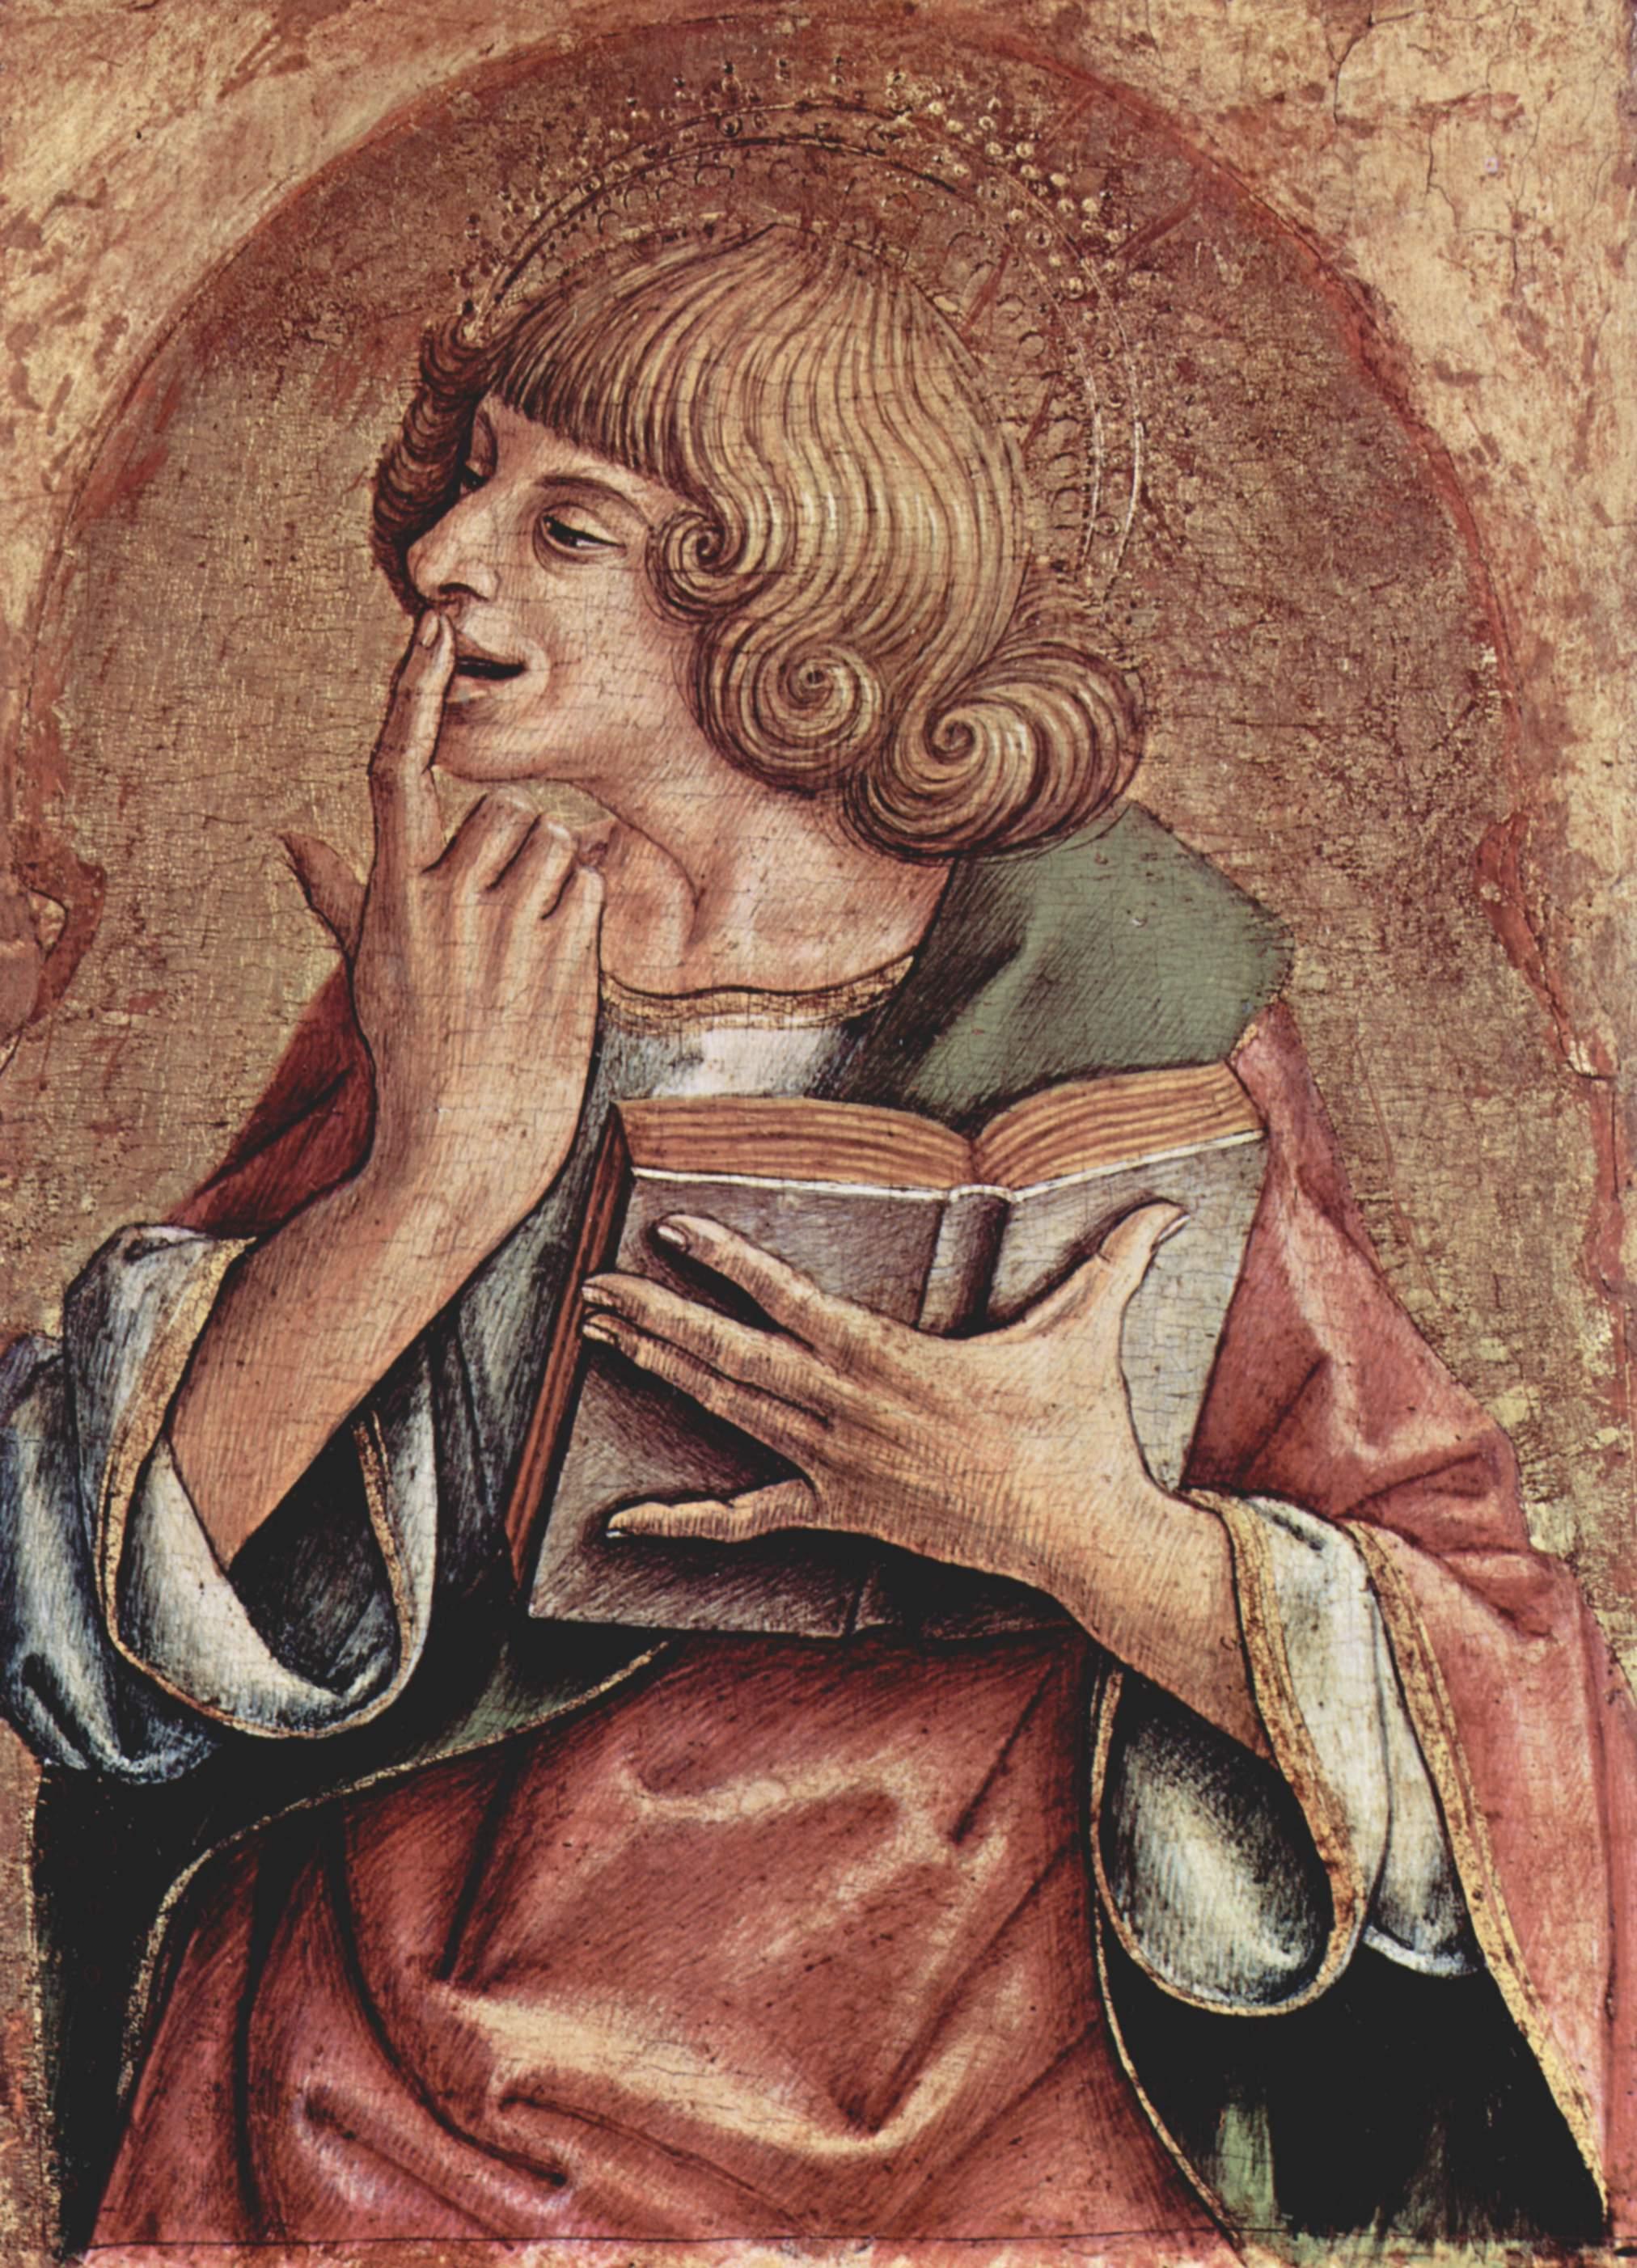 Св. Иоанн Евангелист, Карло Кривелли